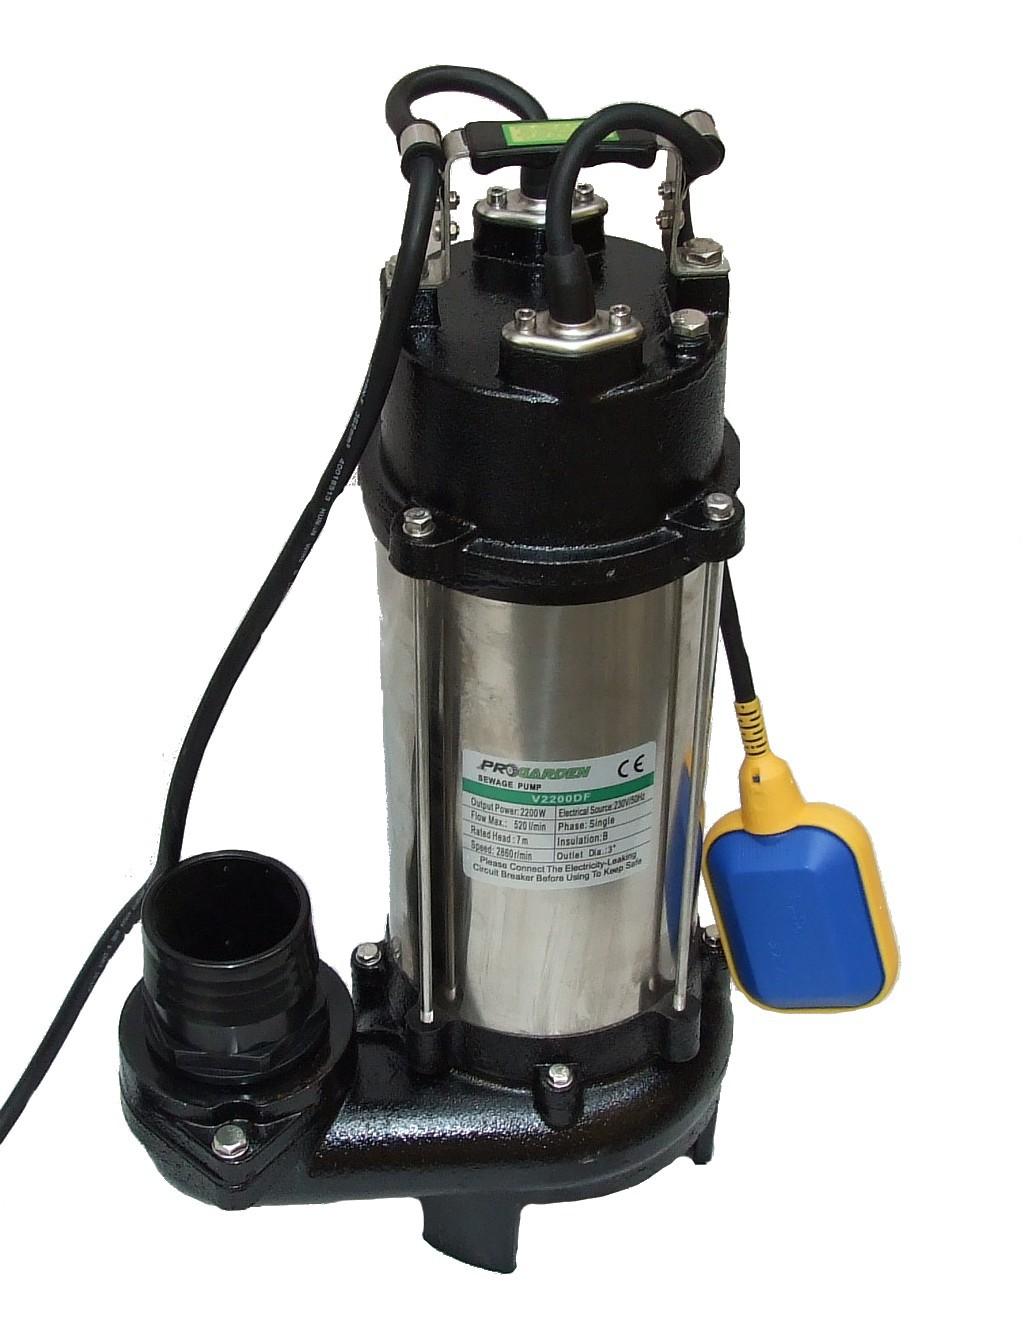 Brico depot pompe stropit pomi pompe submersibile shoogle pag 2 - Pompe brico depot ...